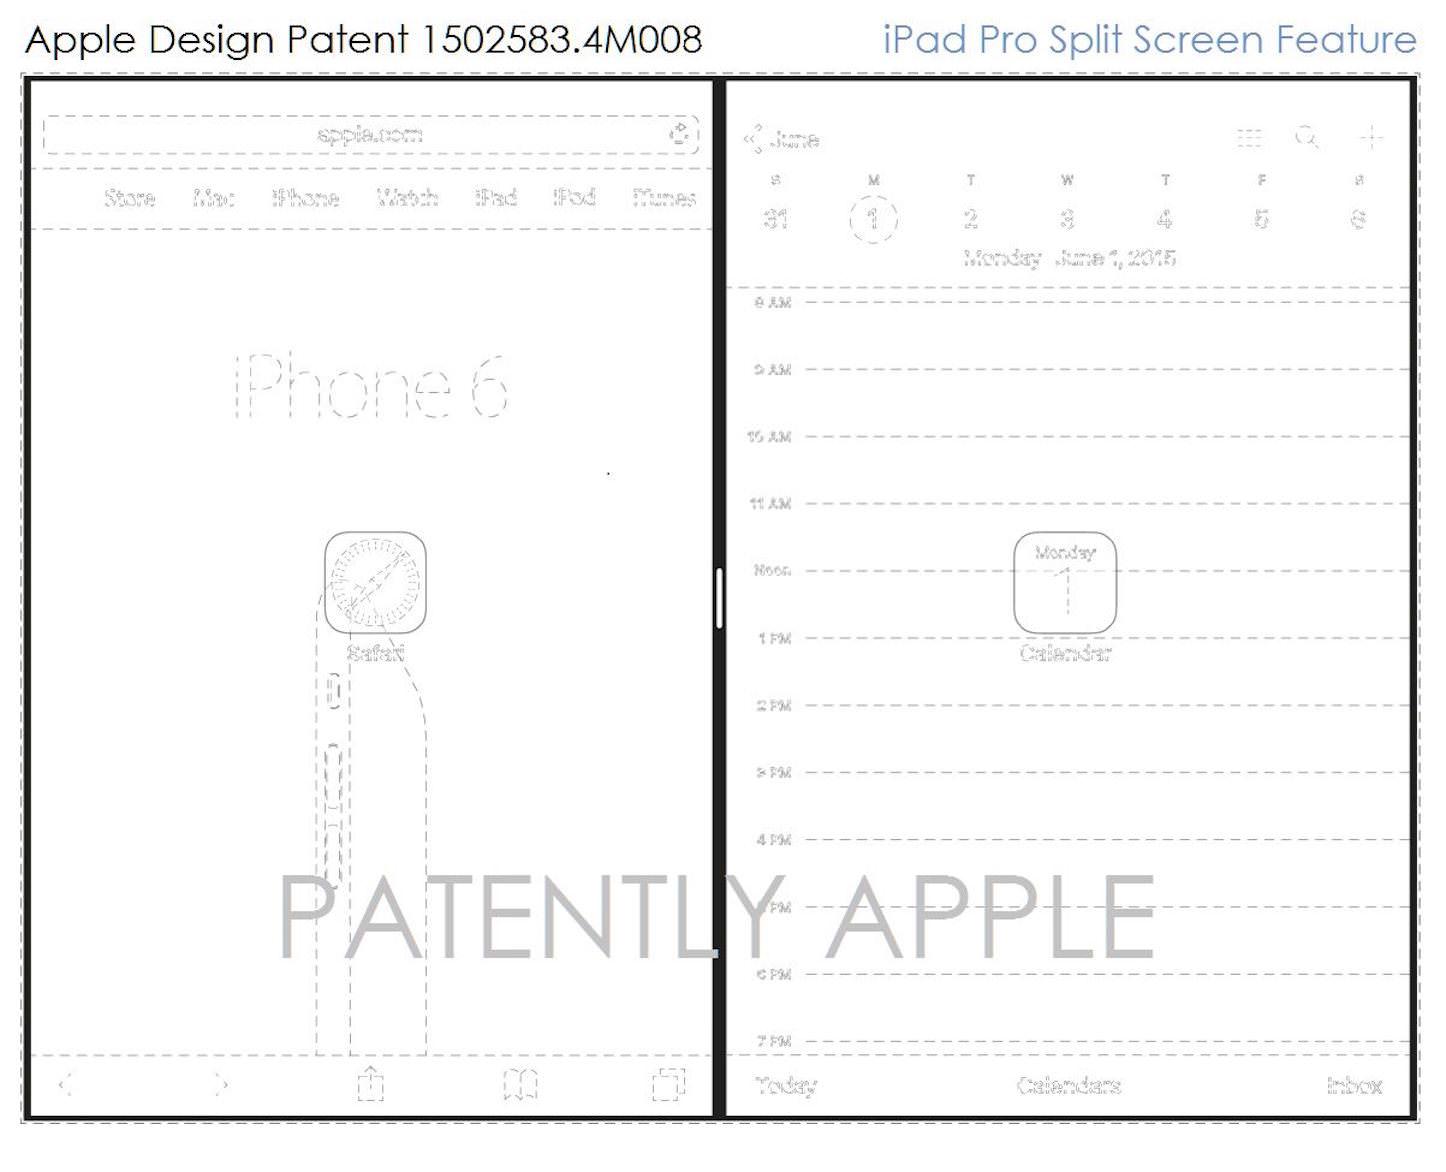 Apple Design Patents for SplitView